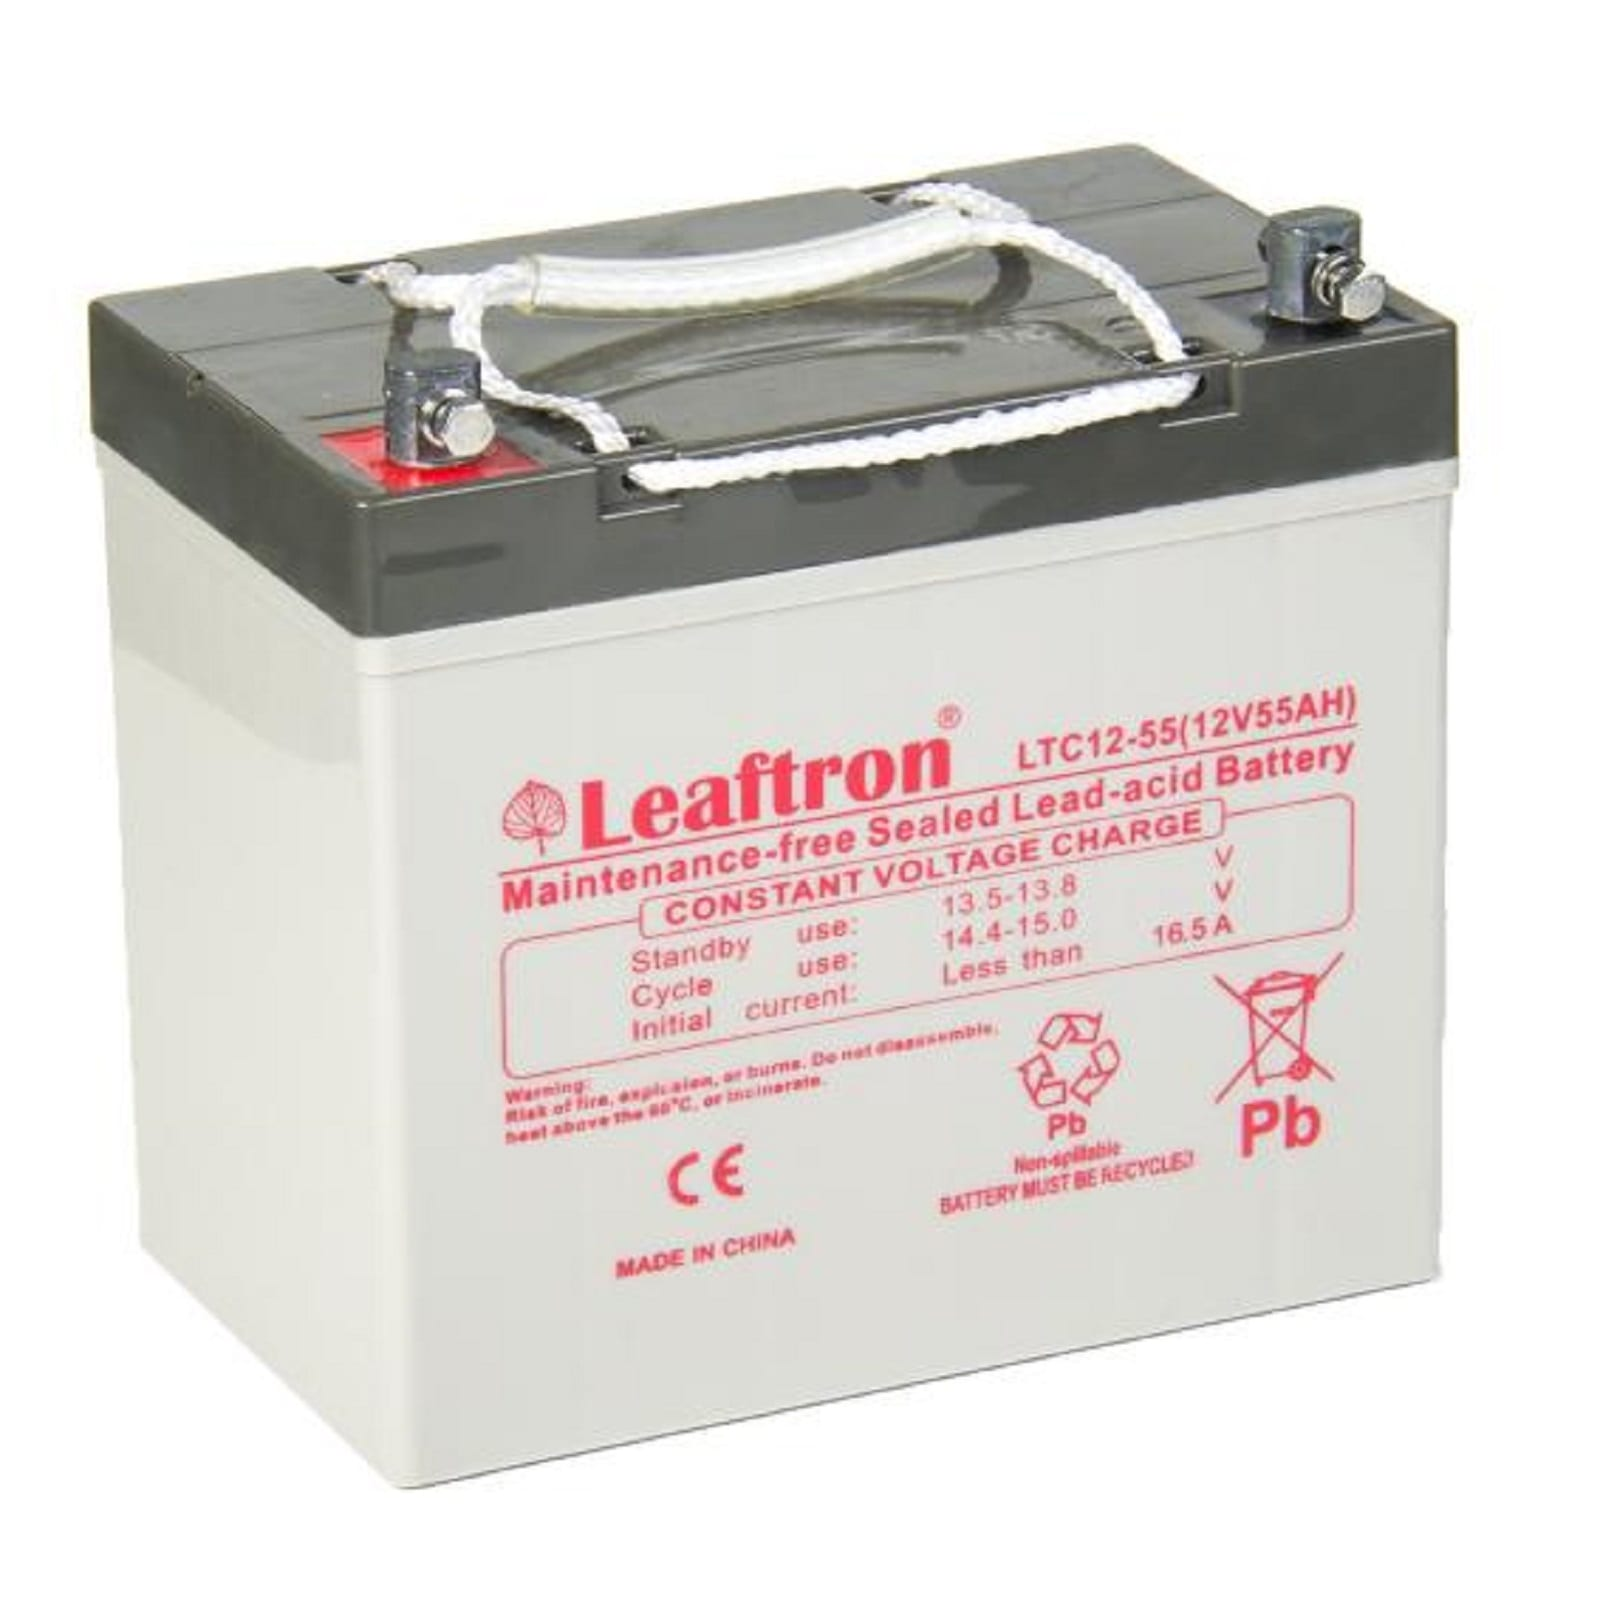 Leaftron1255